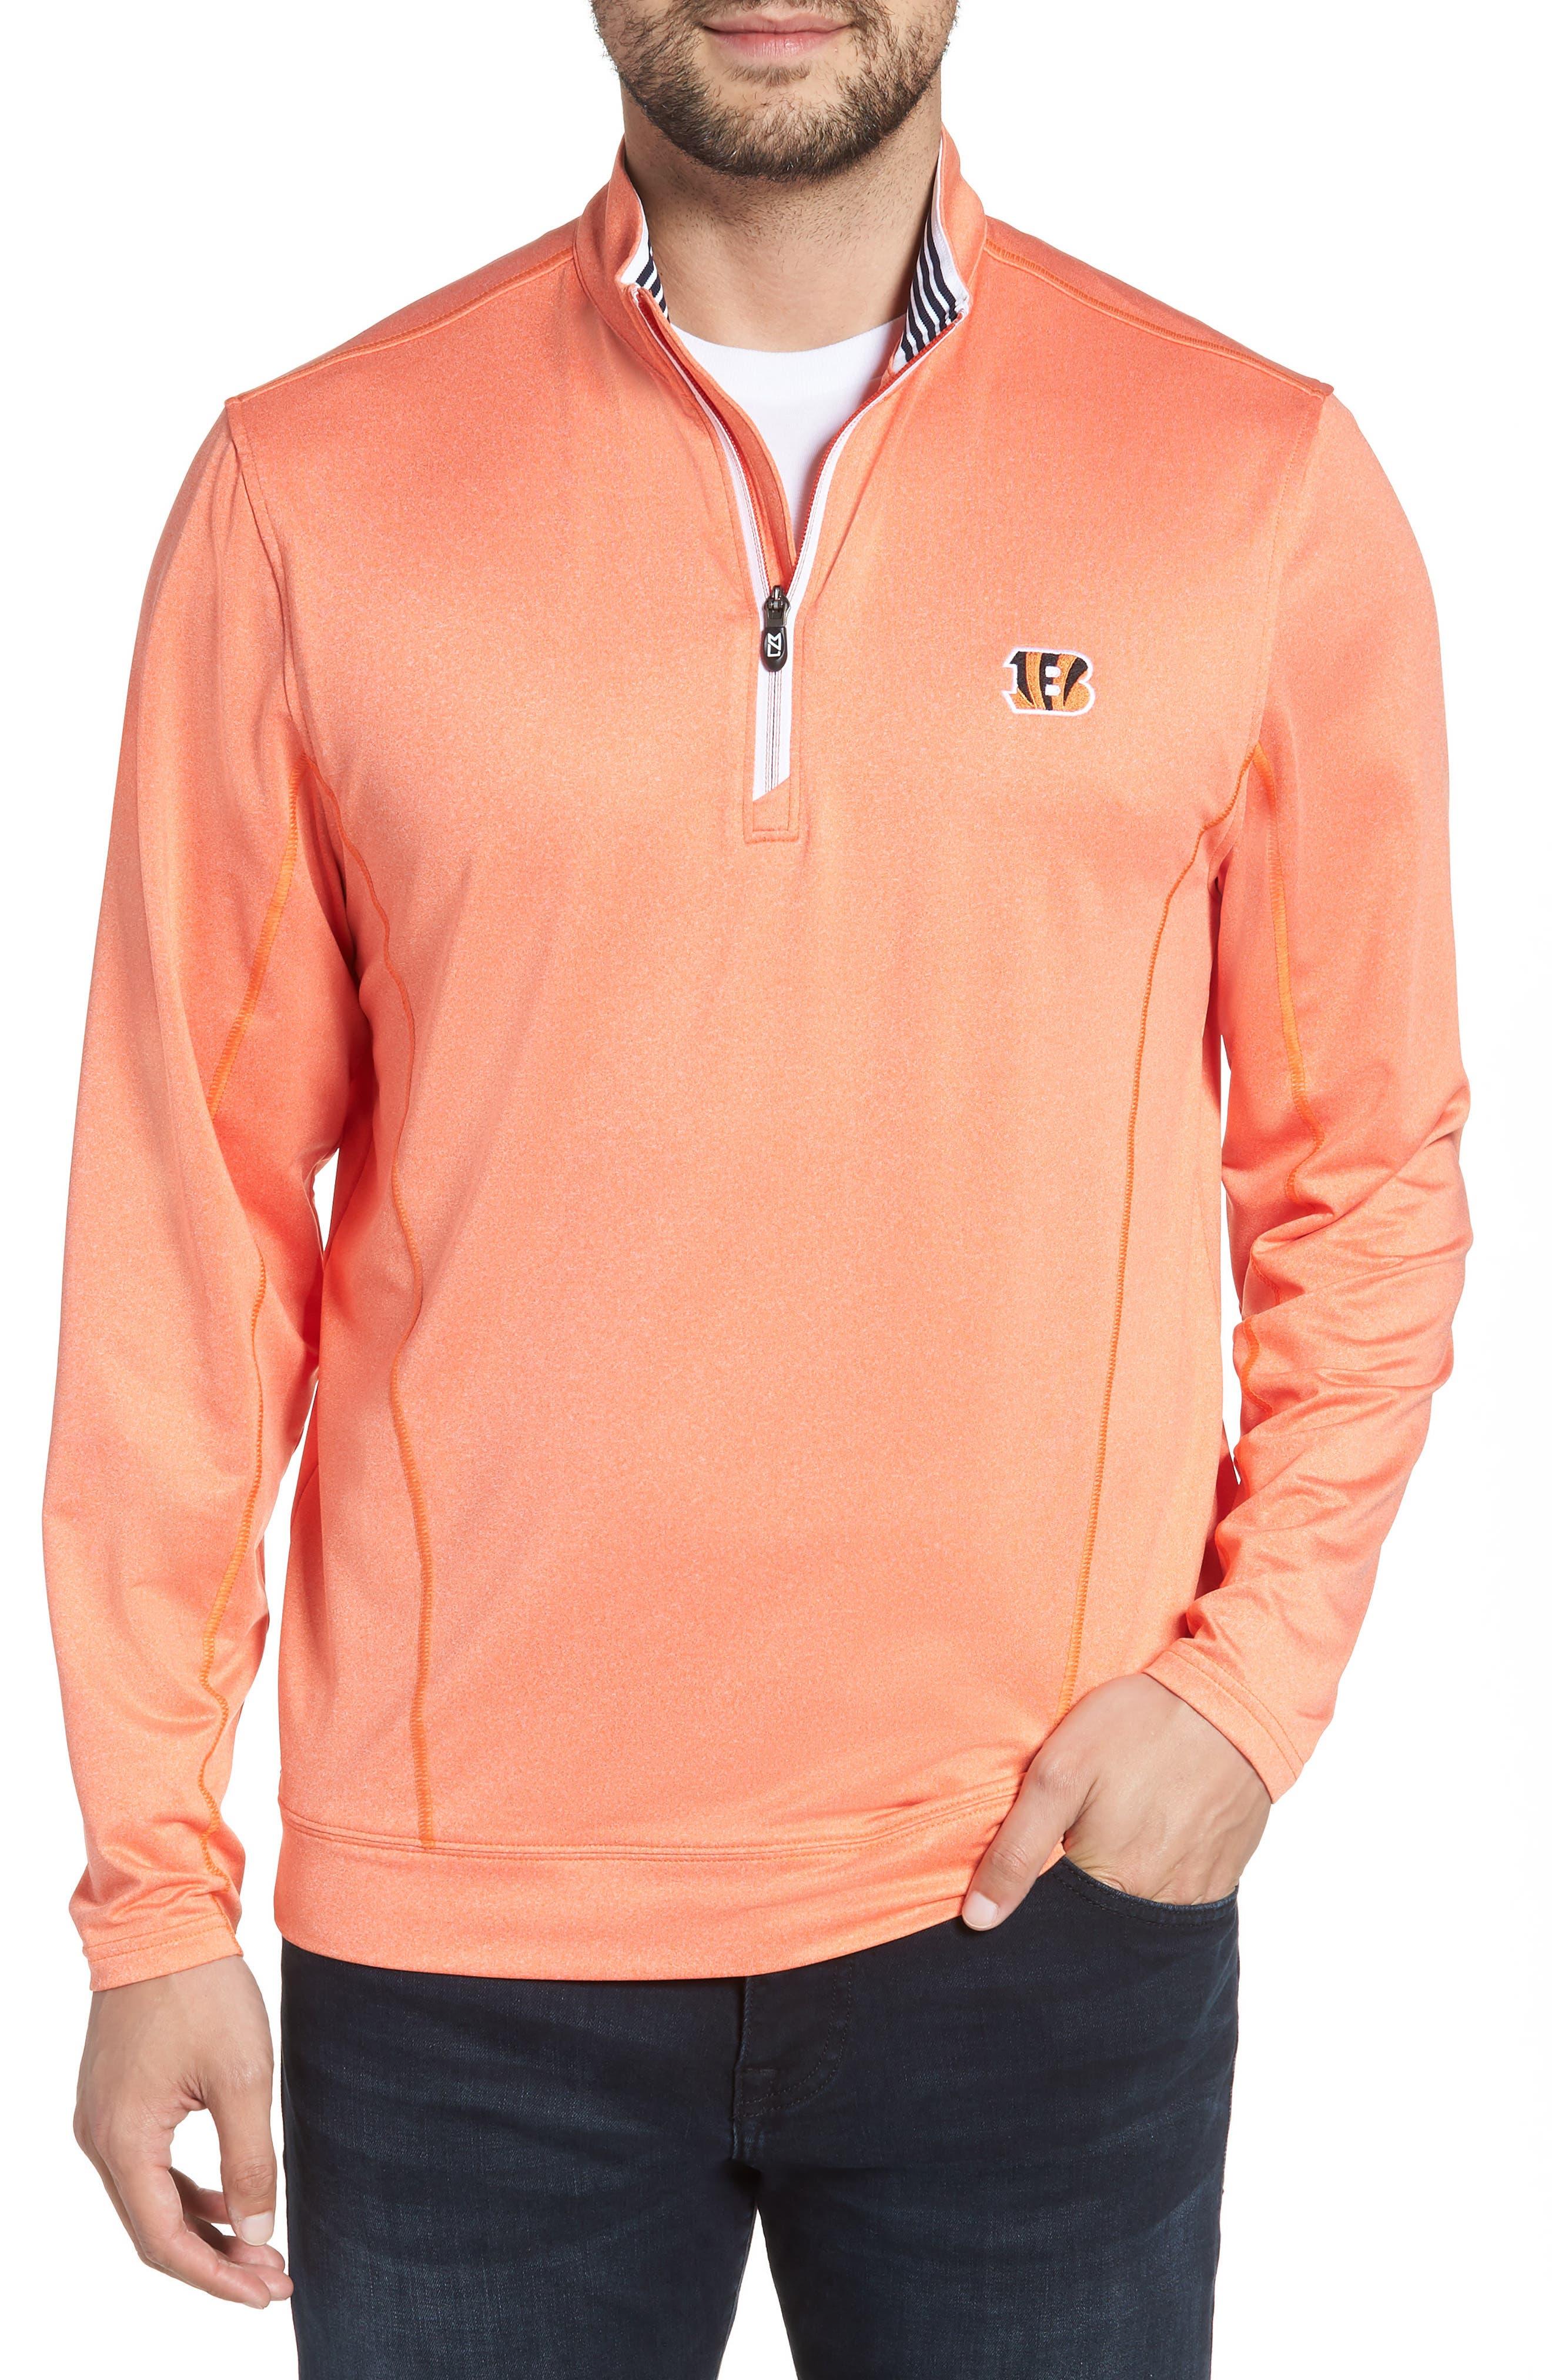 Endurance Cincinnati Bengals Regular Fit Pullover,                         Main,                         color, COLLEGE ORANGE HEATHER